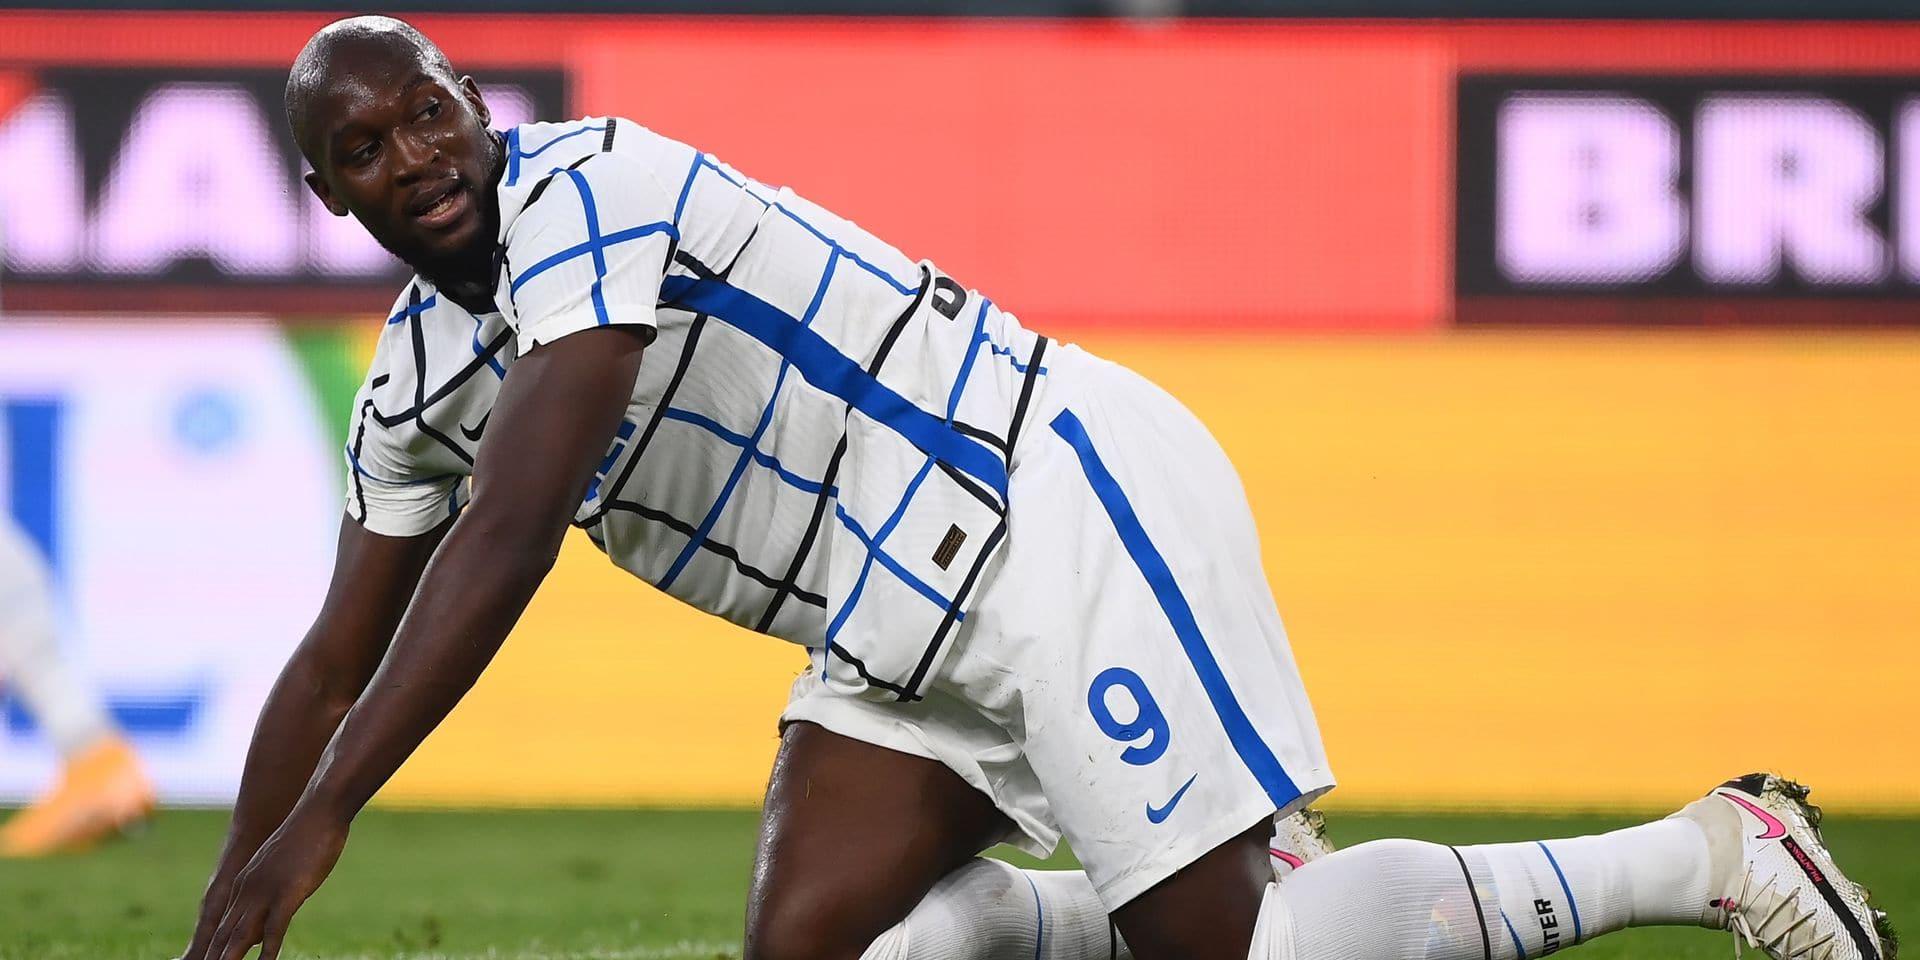 Romelu Lukaku, coupé en plein élan